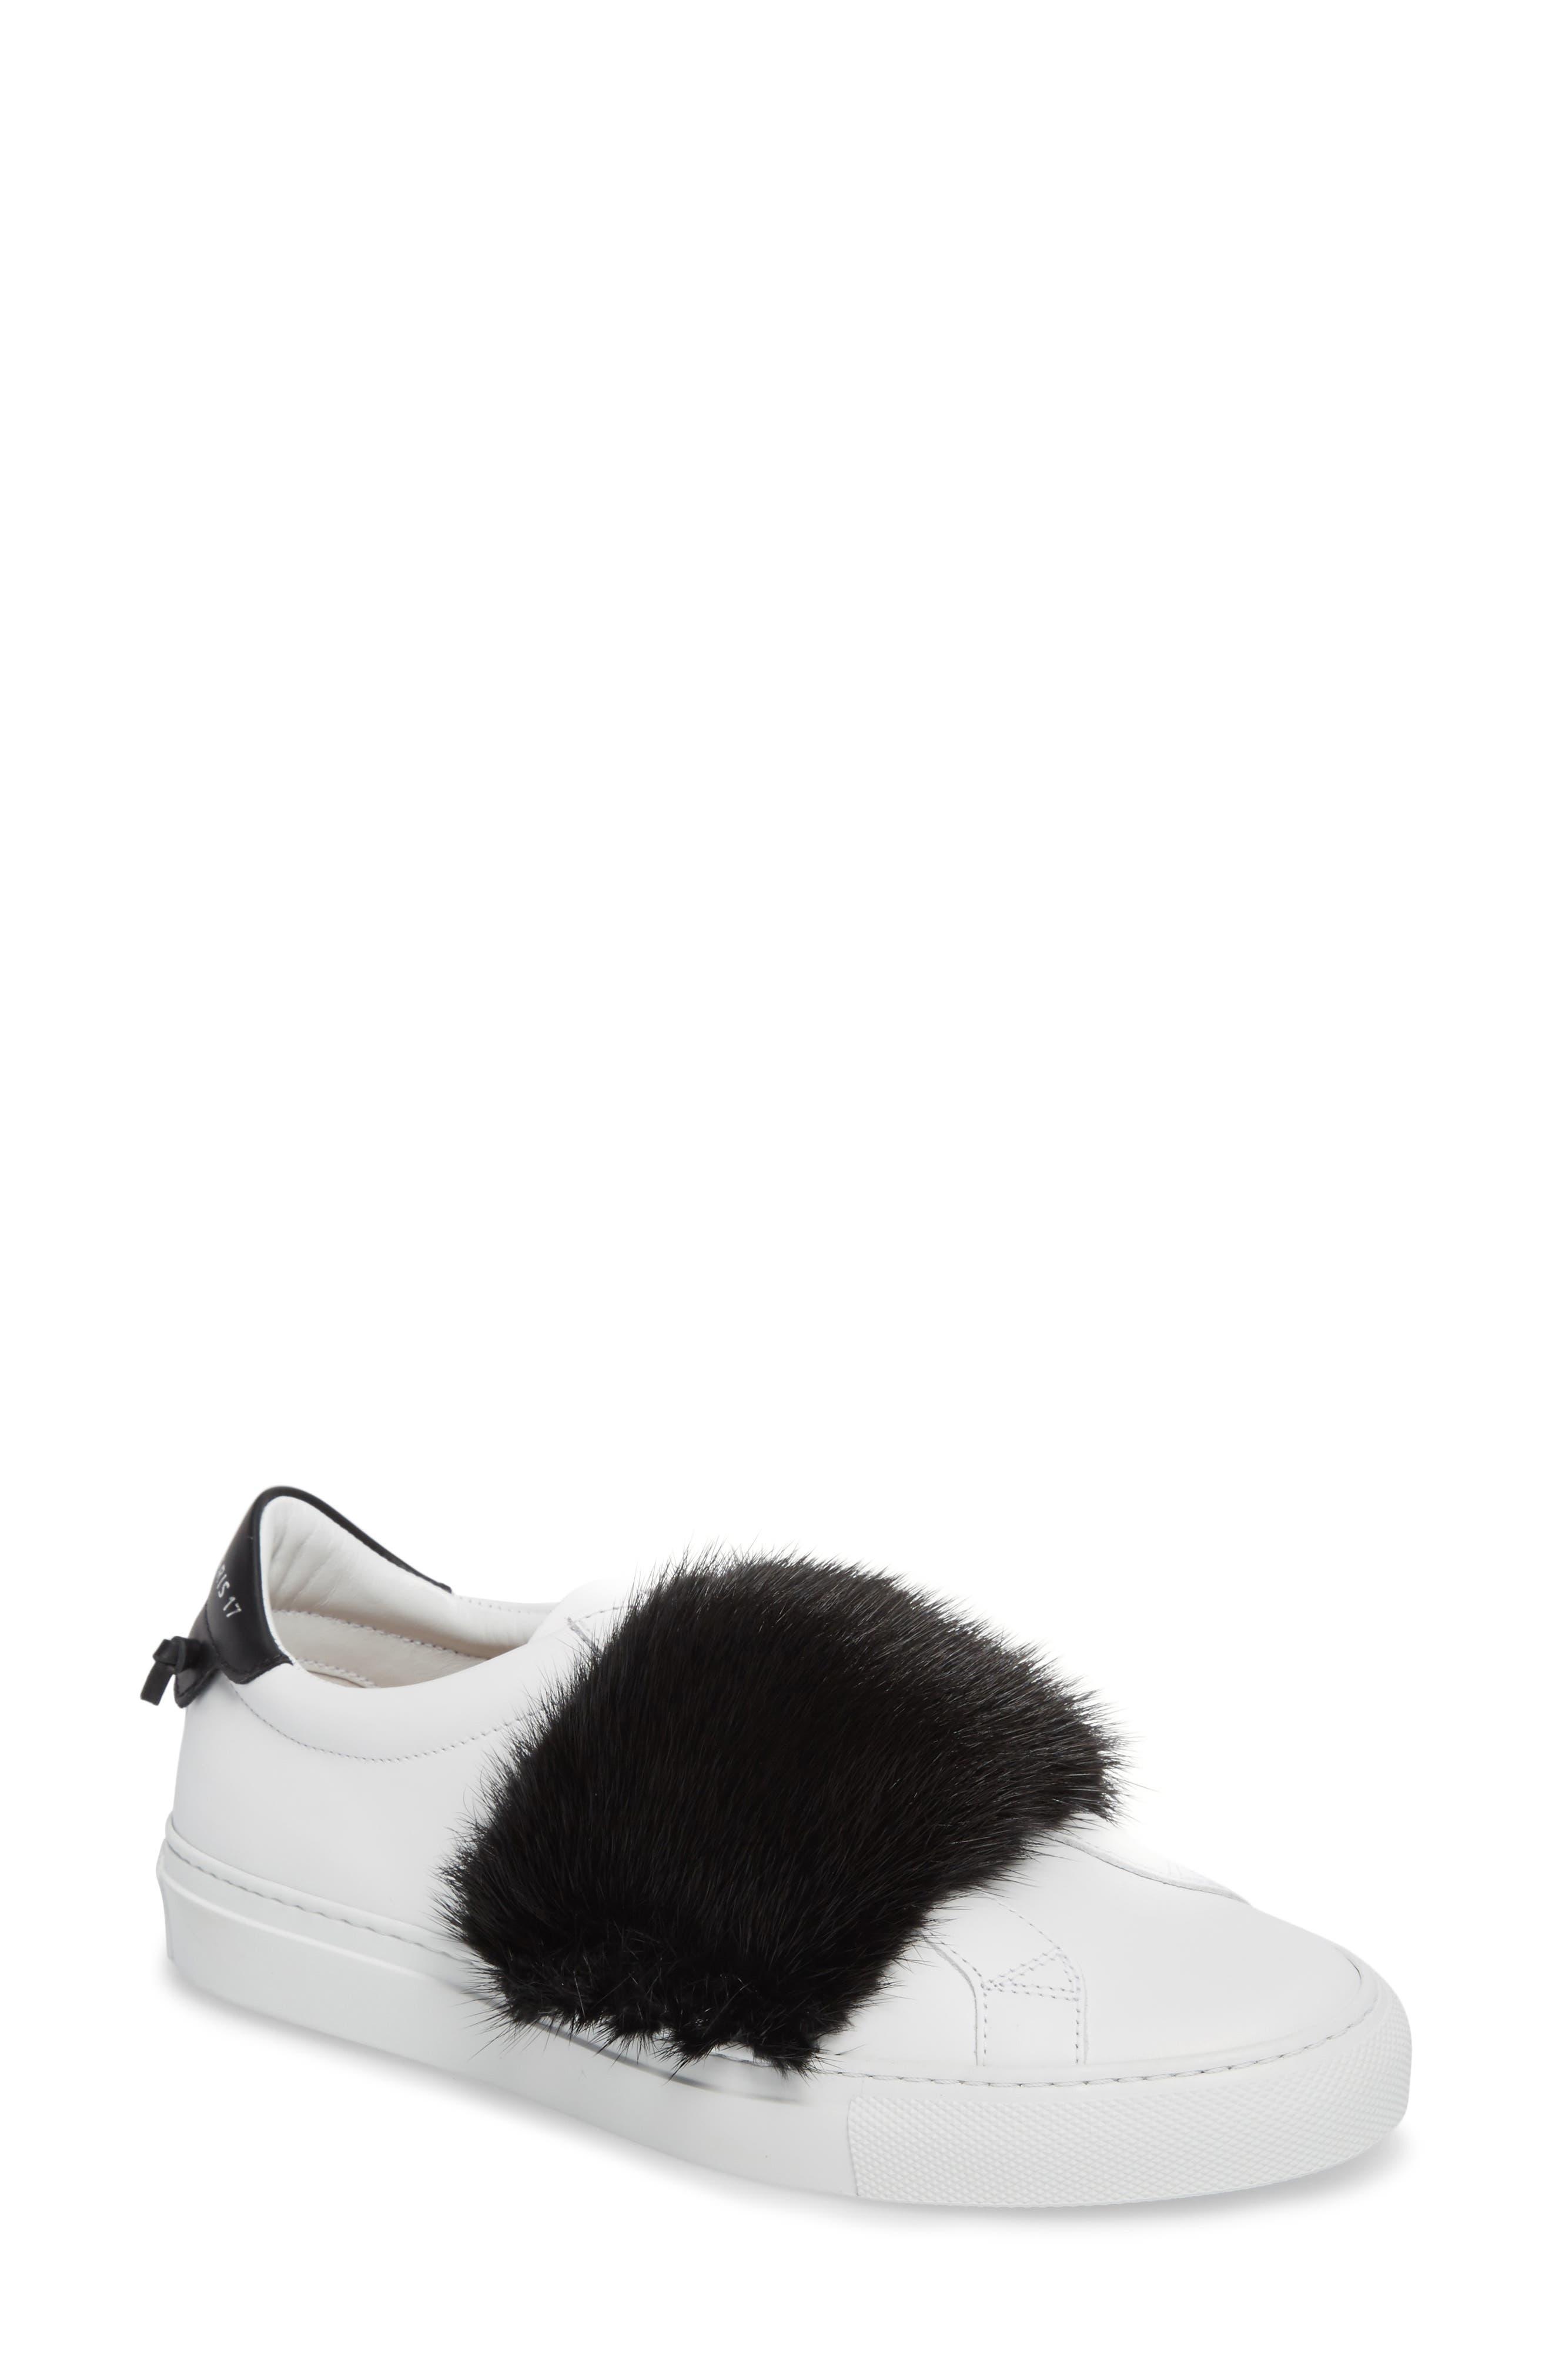 Sneaker with Genuine Mink Fur Trim